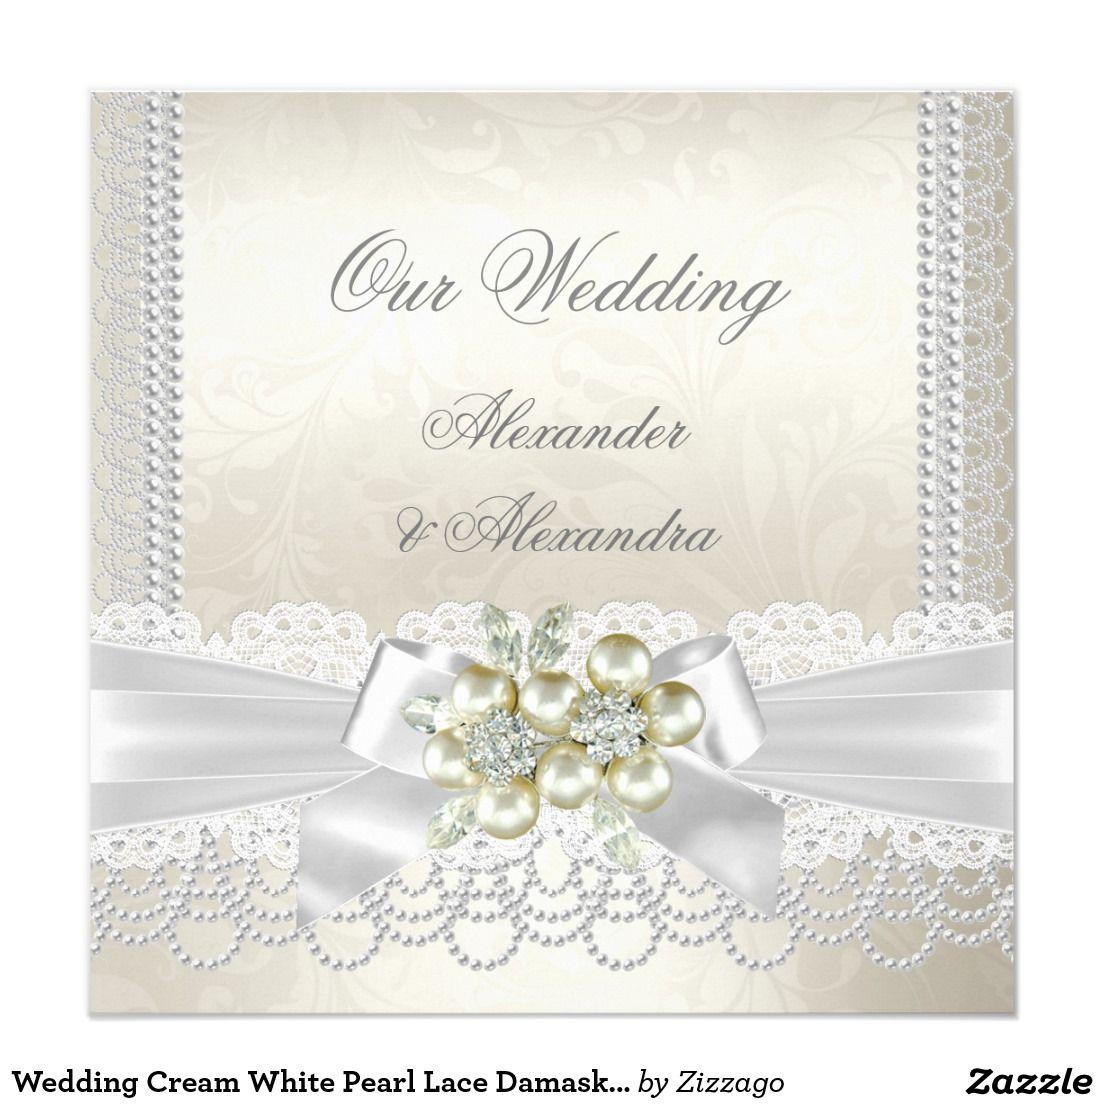 Wedding Cream White Pearl Lace Damask Diamond 5.25x5.25 Square Paper ...